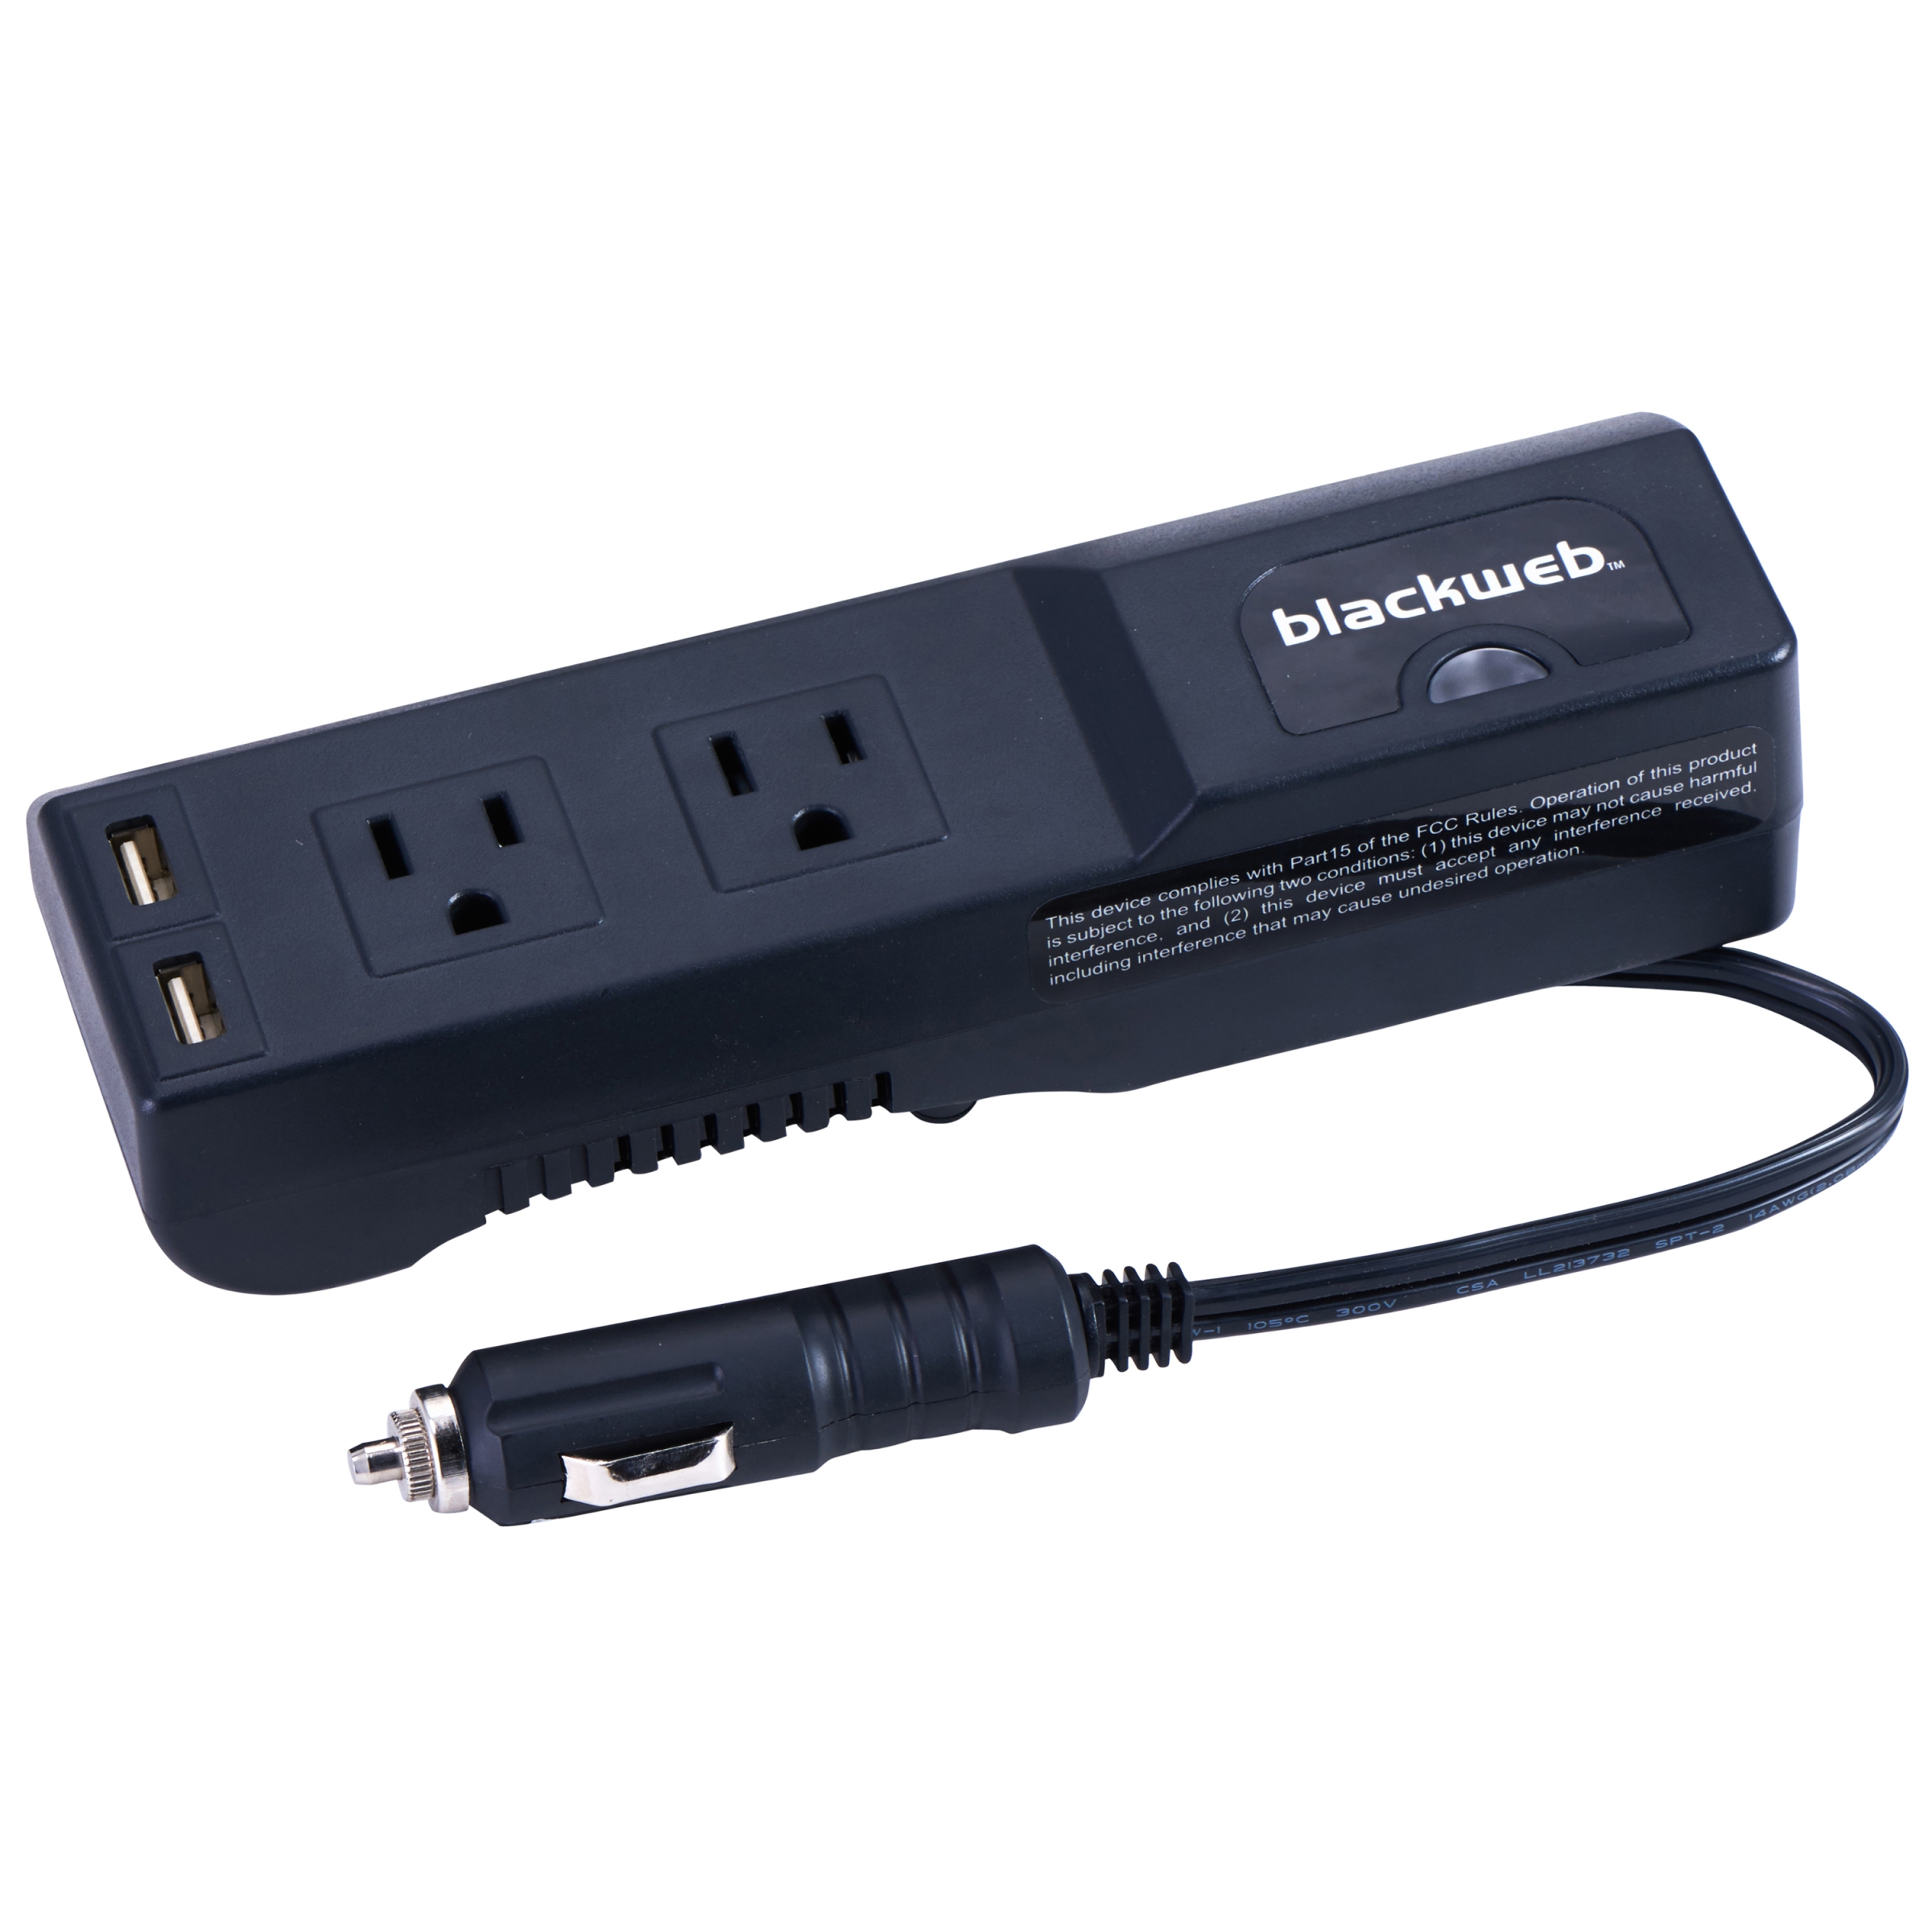 Blackweb 175 Watts Power Strip Inverter for Car Charging, 3 ft Power Cord